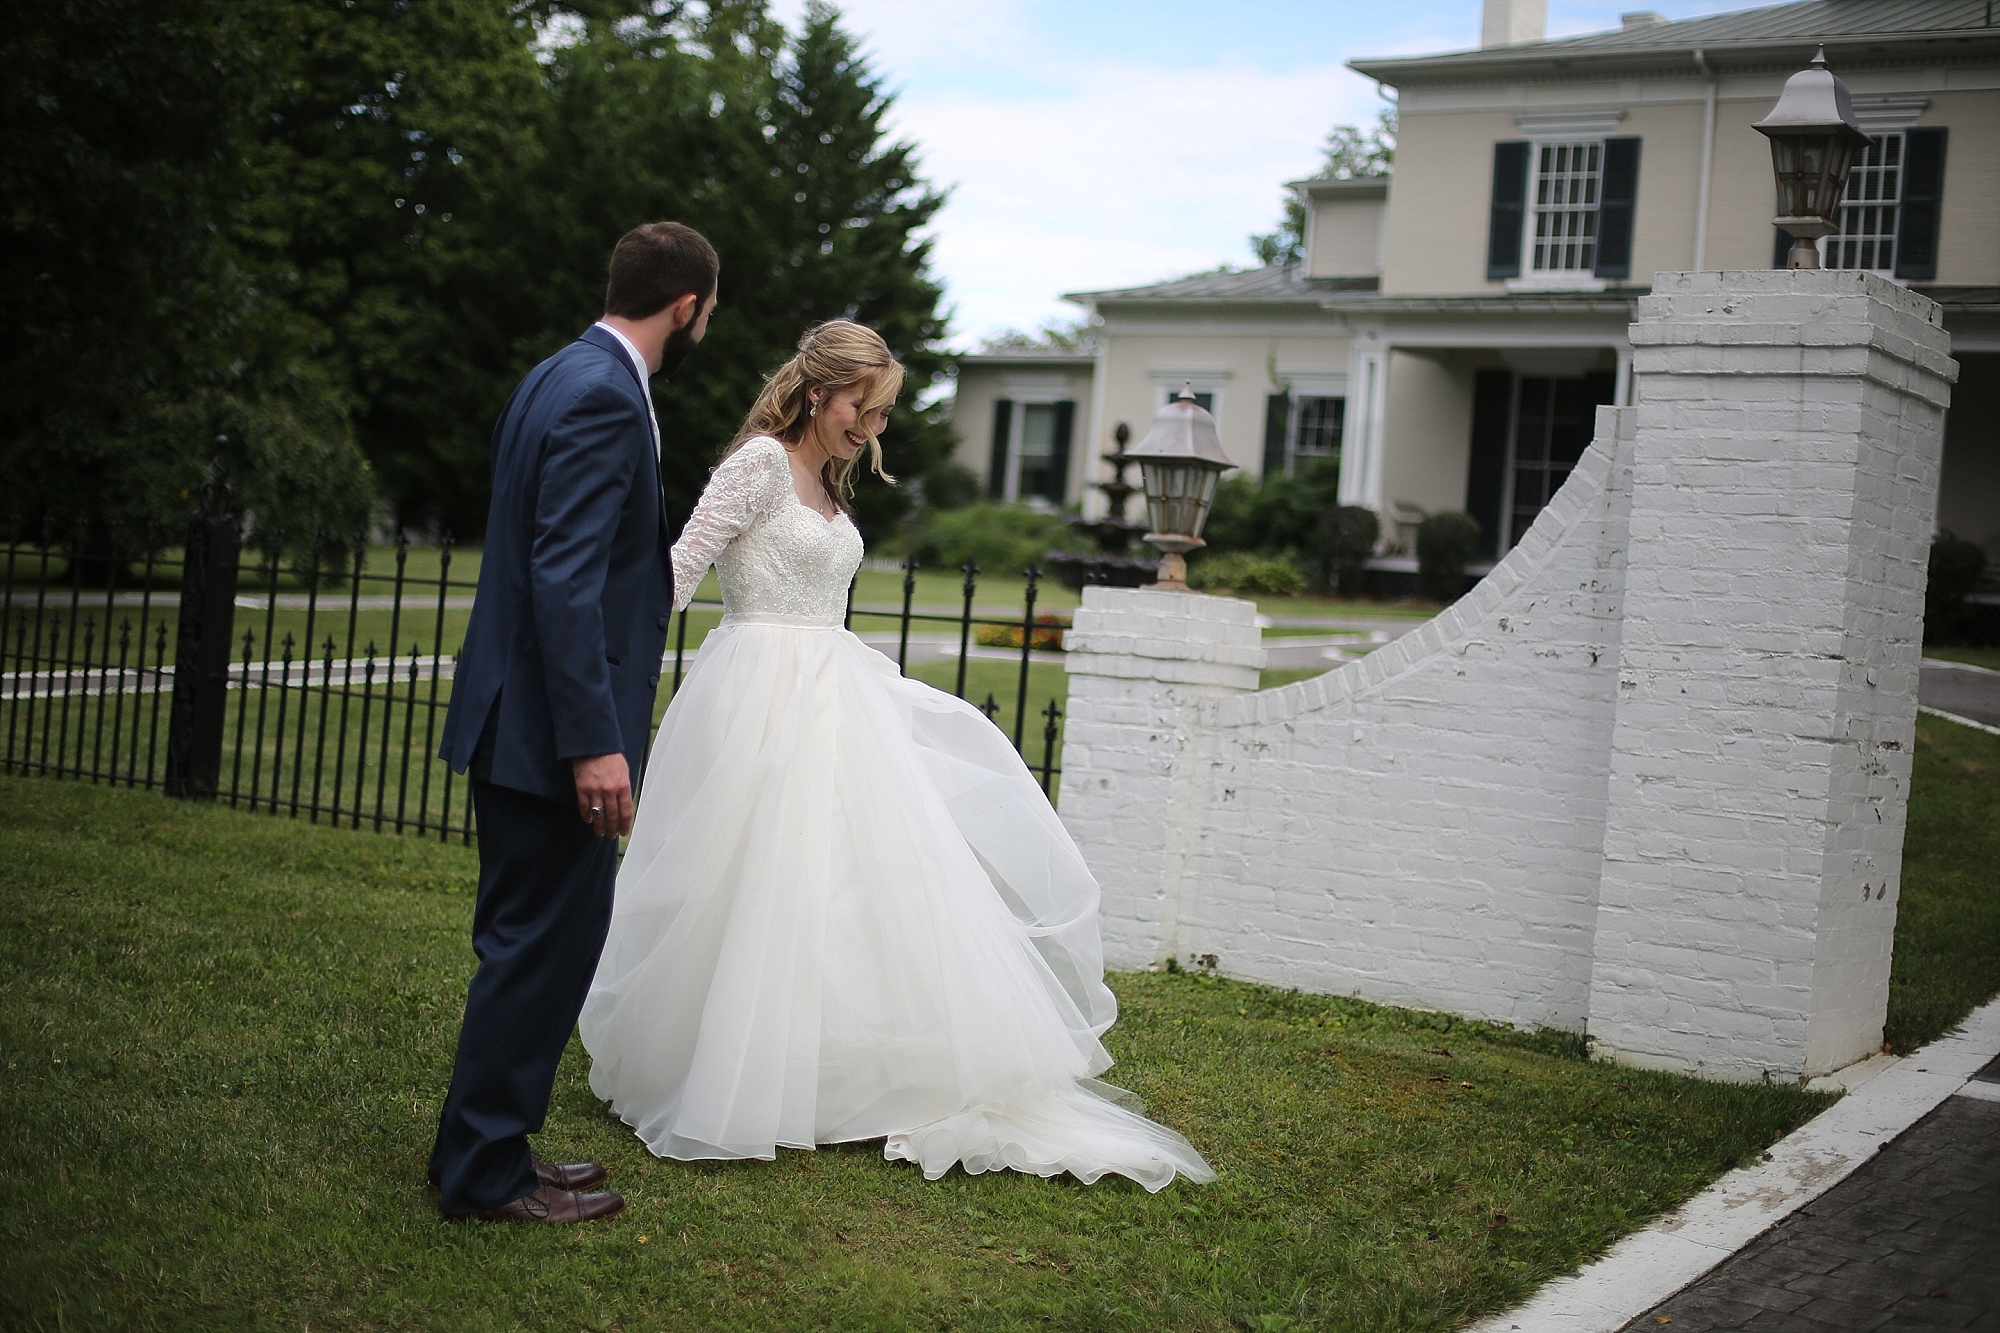 Wytheville Golf Club Wedding Photography | Southwest Virginia Wedding Photographer, Holly Cromer